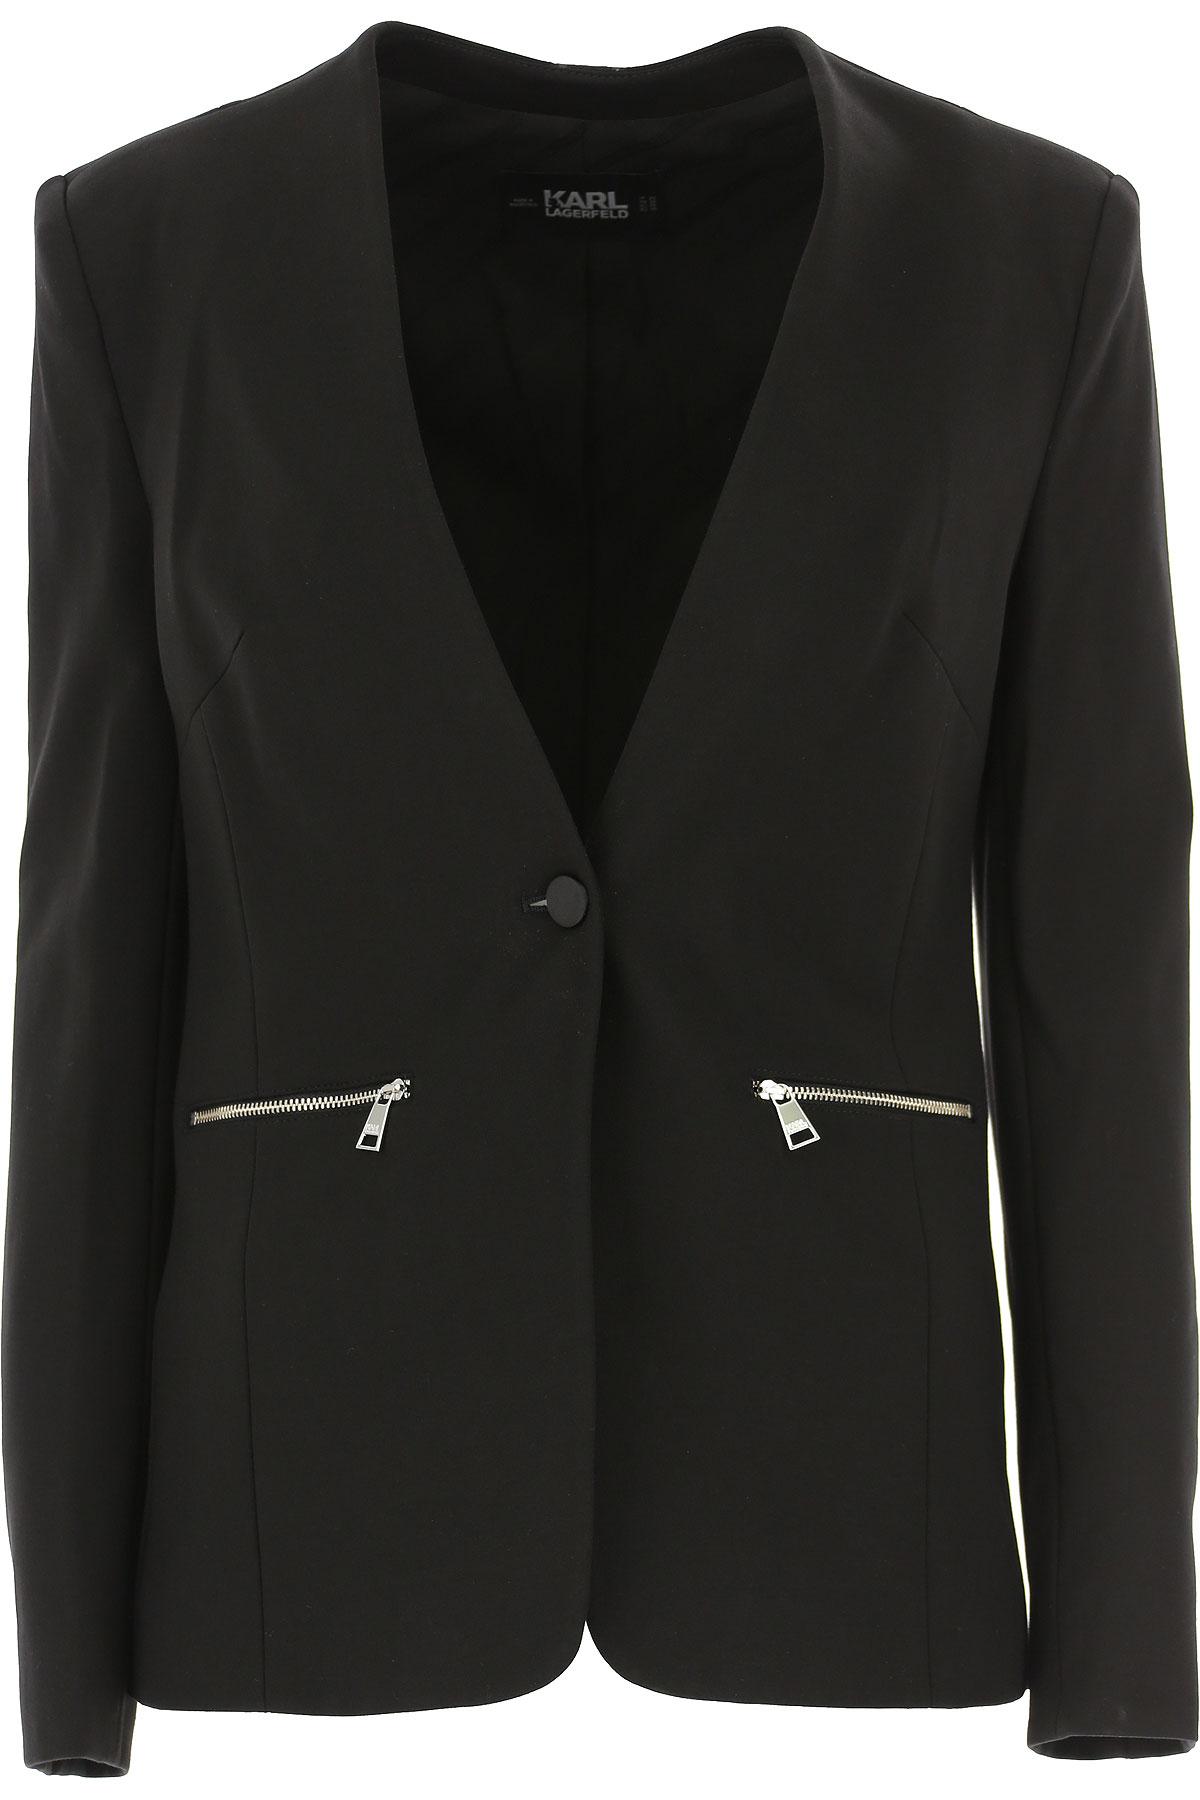 Karl Lagerfeld Blazer for Women On Sale, Black, viscosa, 2019, 4 6 8